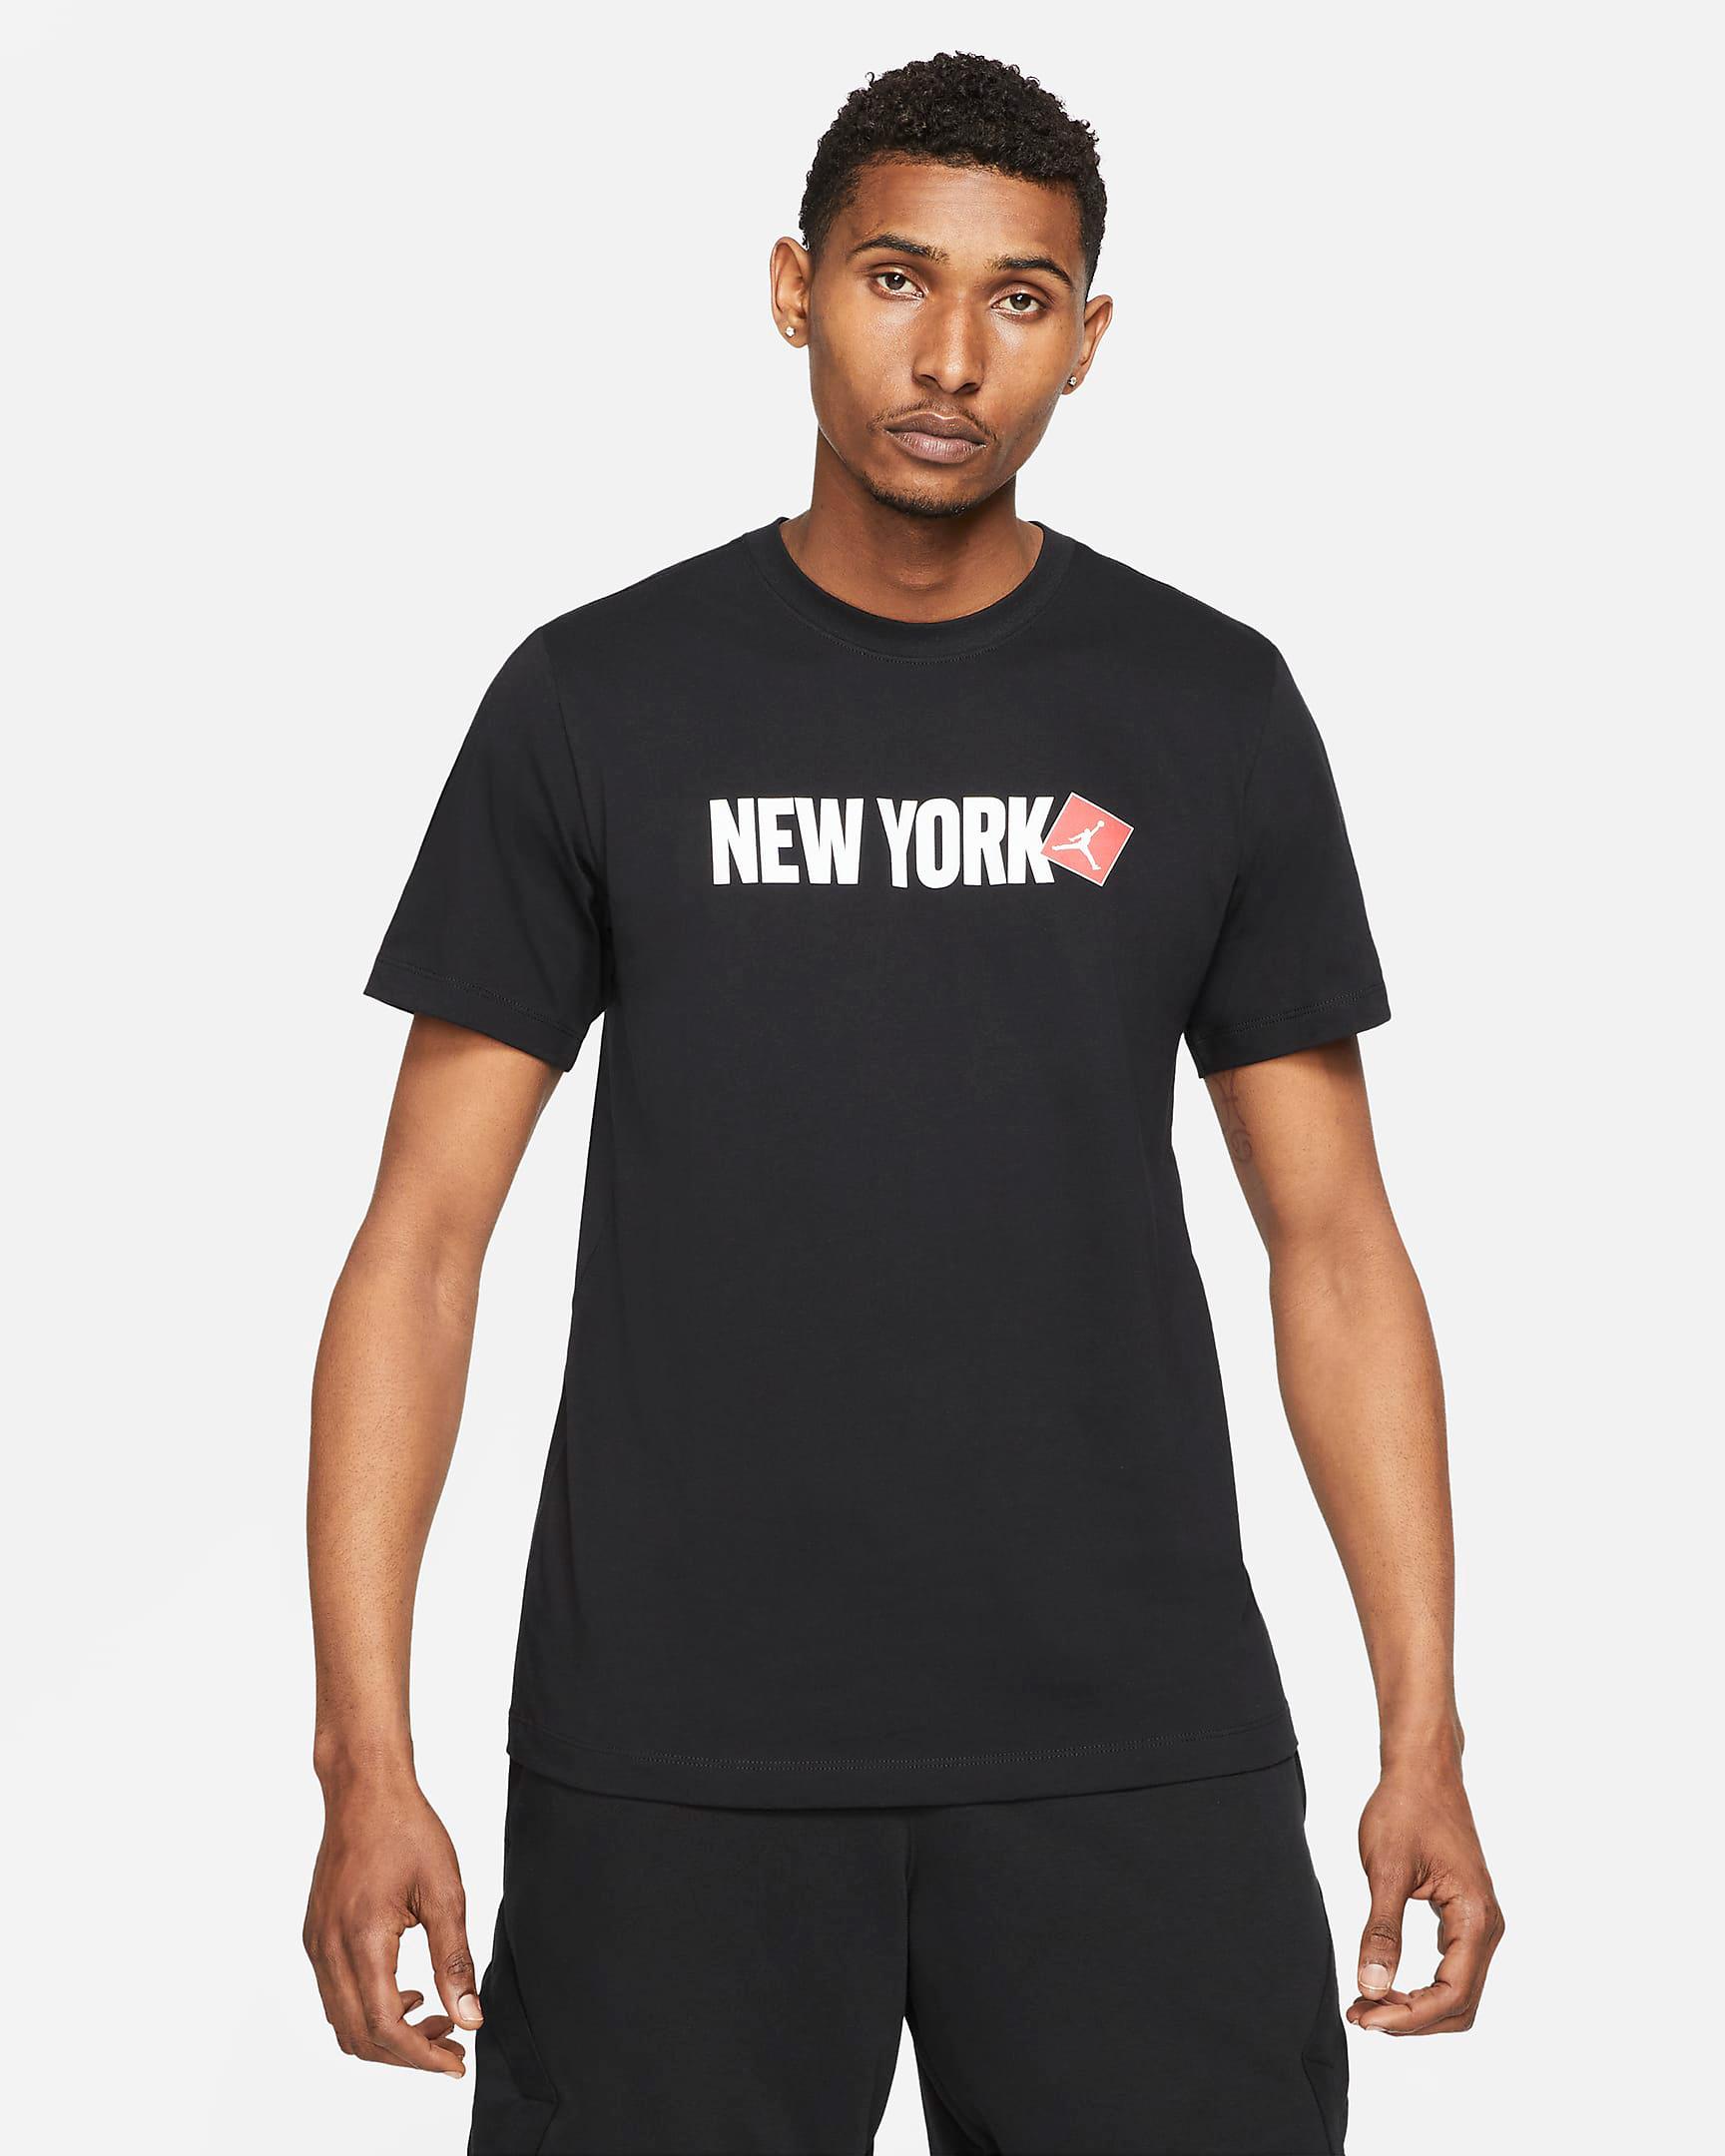 jordan-new-york-city-black-shirt-2